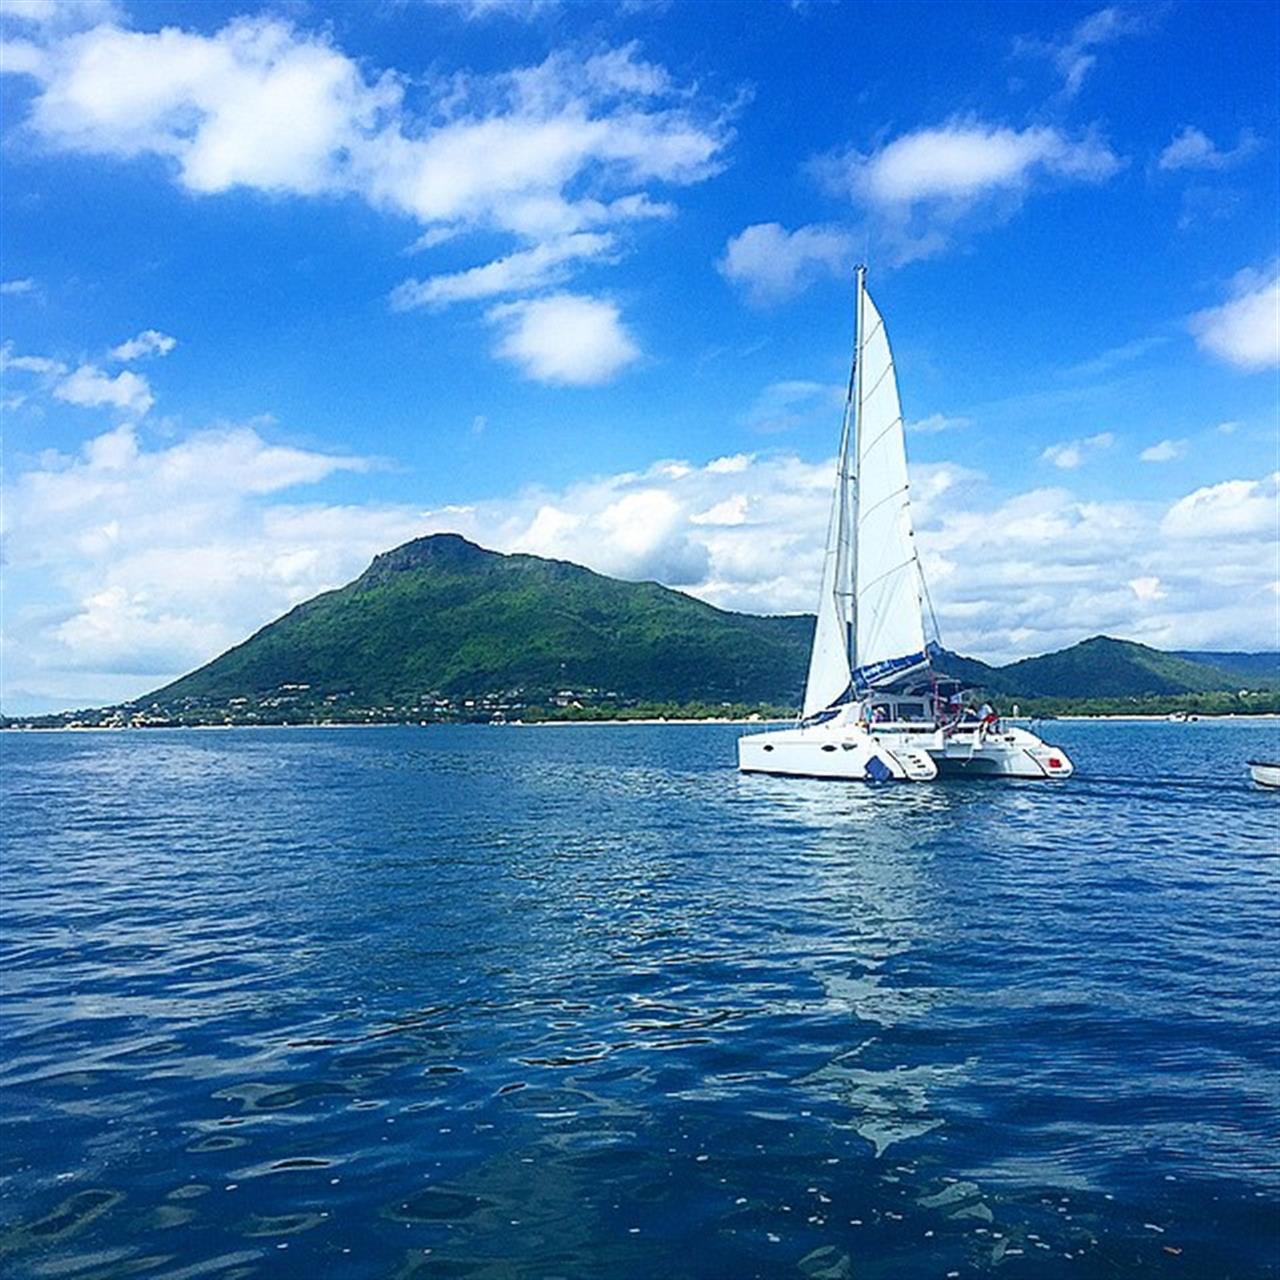 #sailing #catamaran #mauritius #LeadingRelocal #lagoon